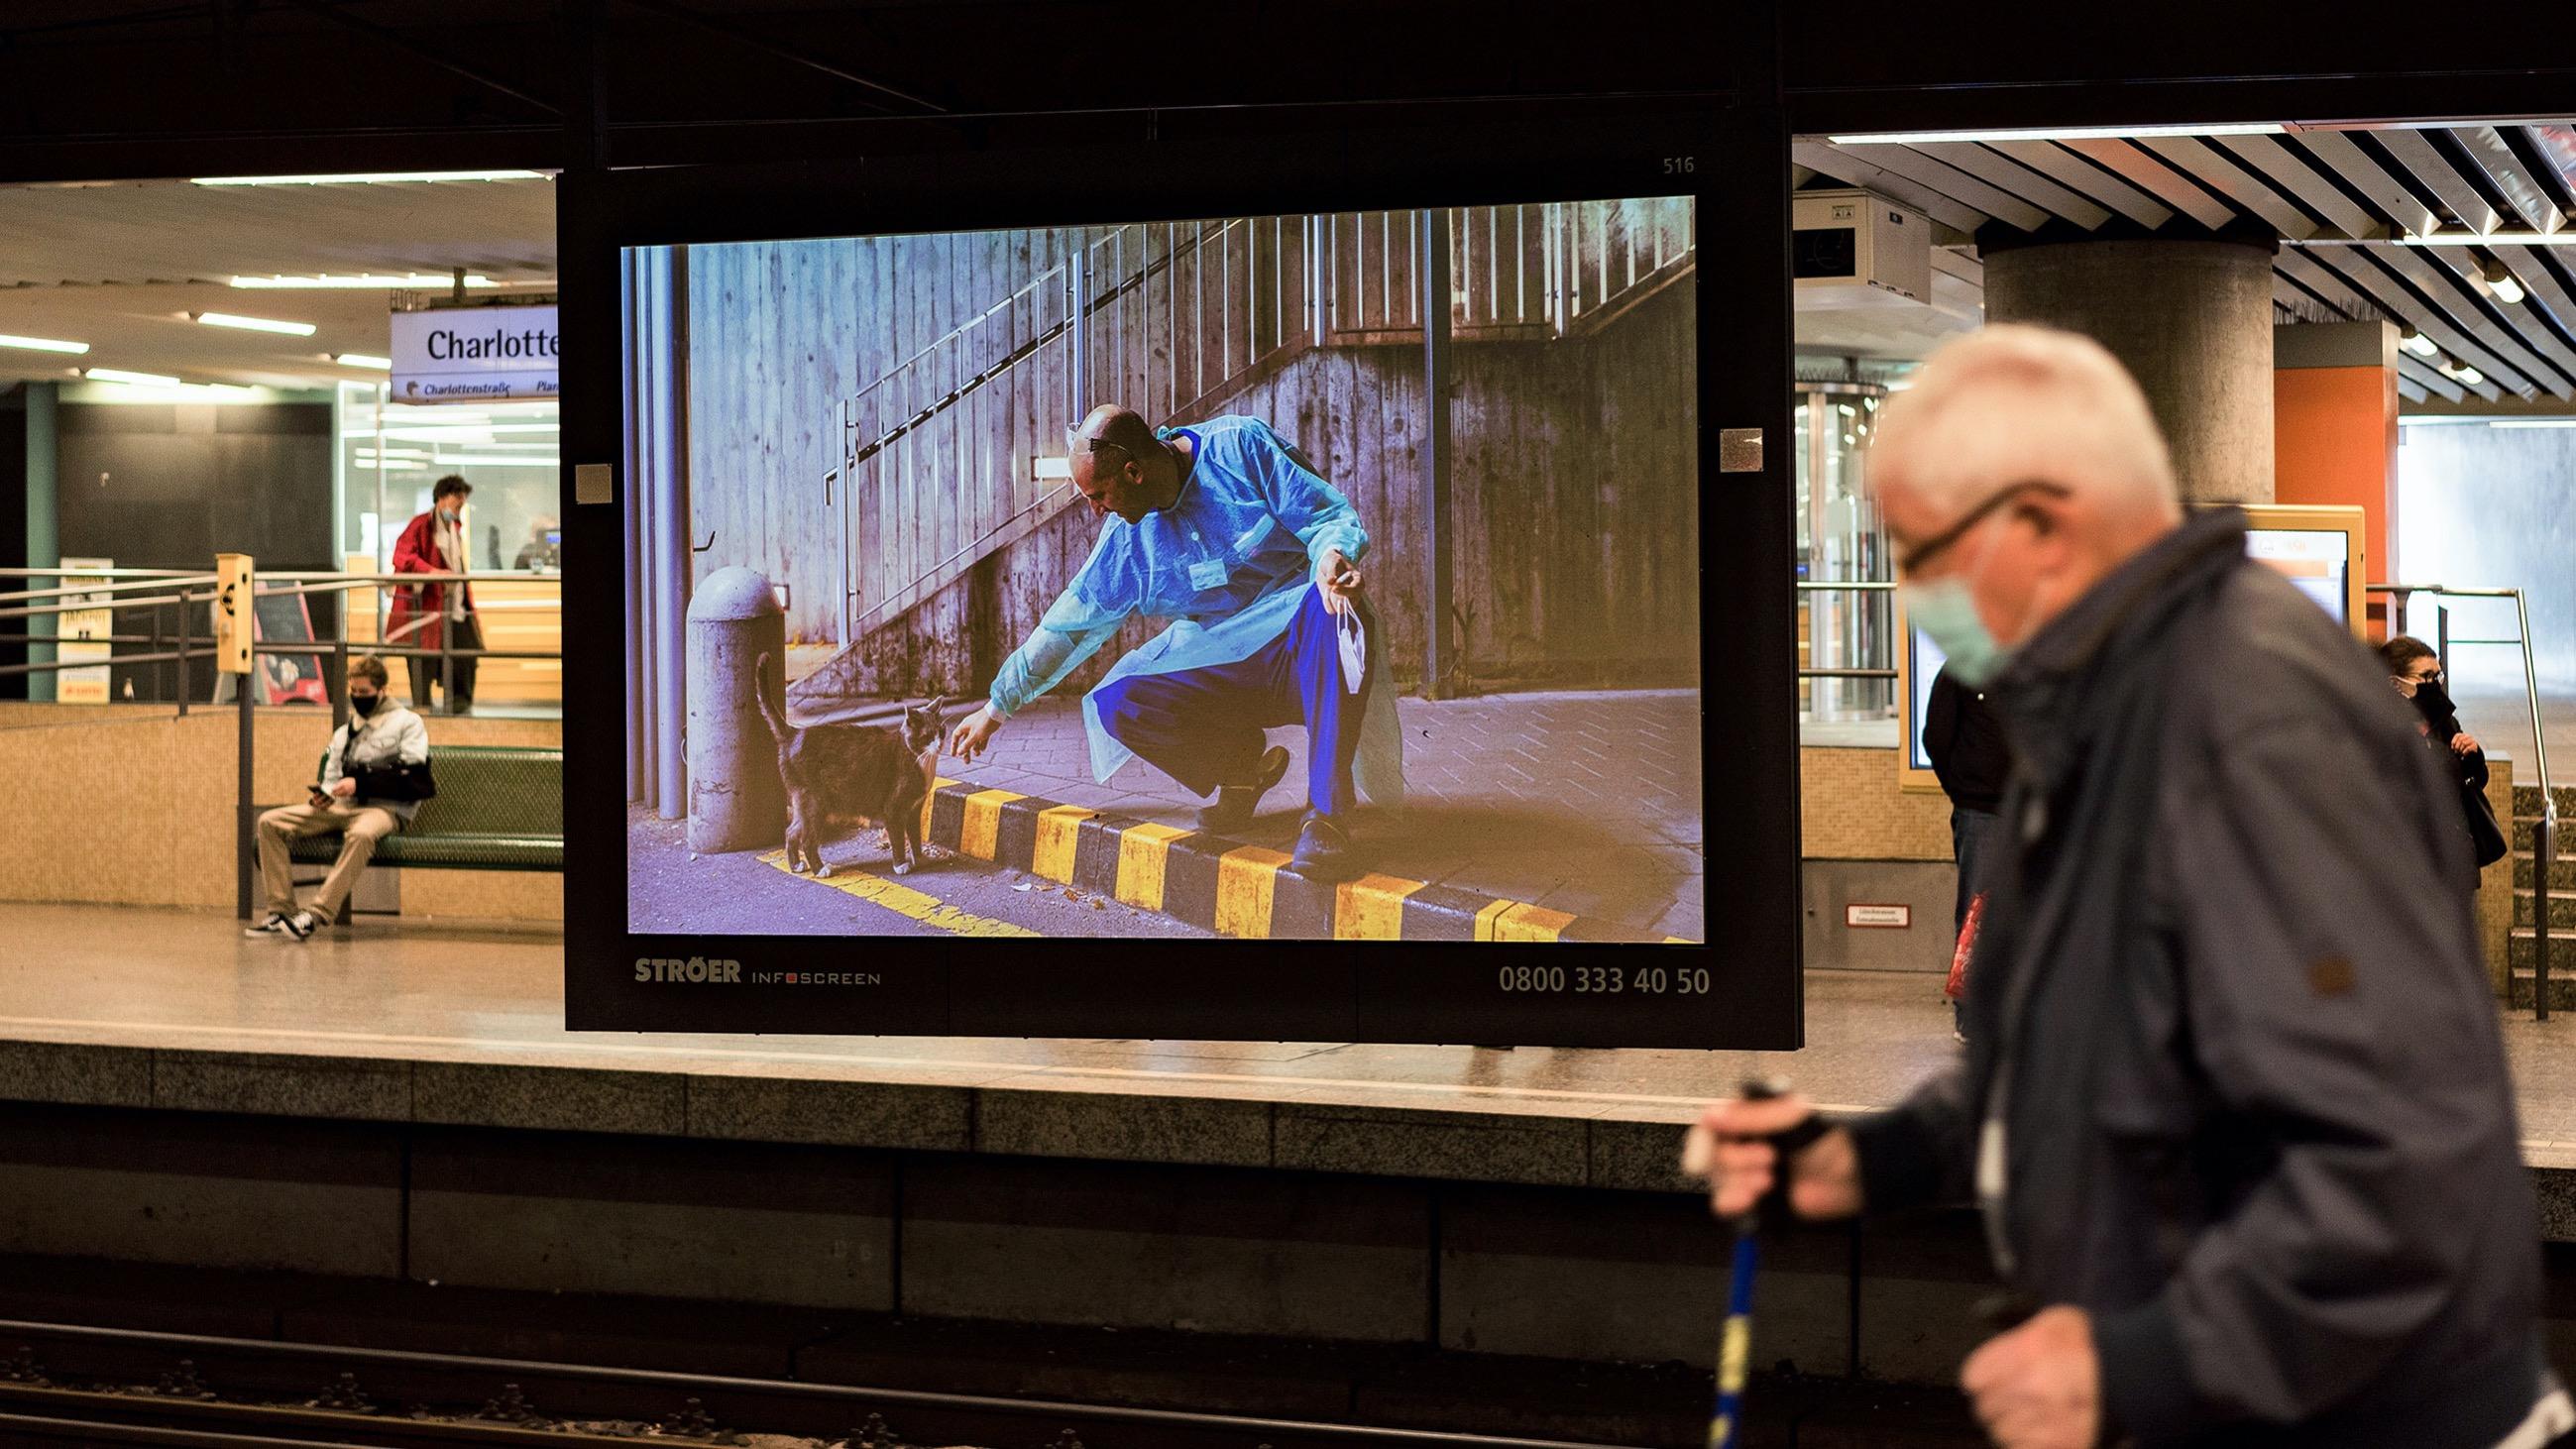 digitale portraits in stuttgart u bahnhoefen